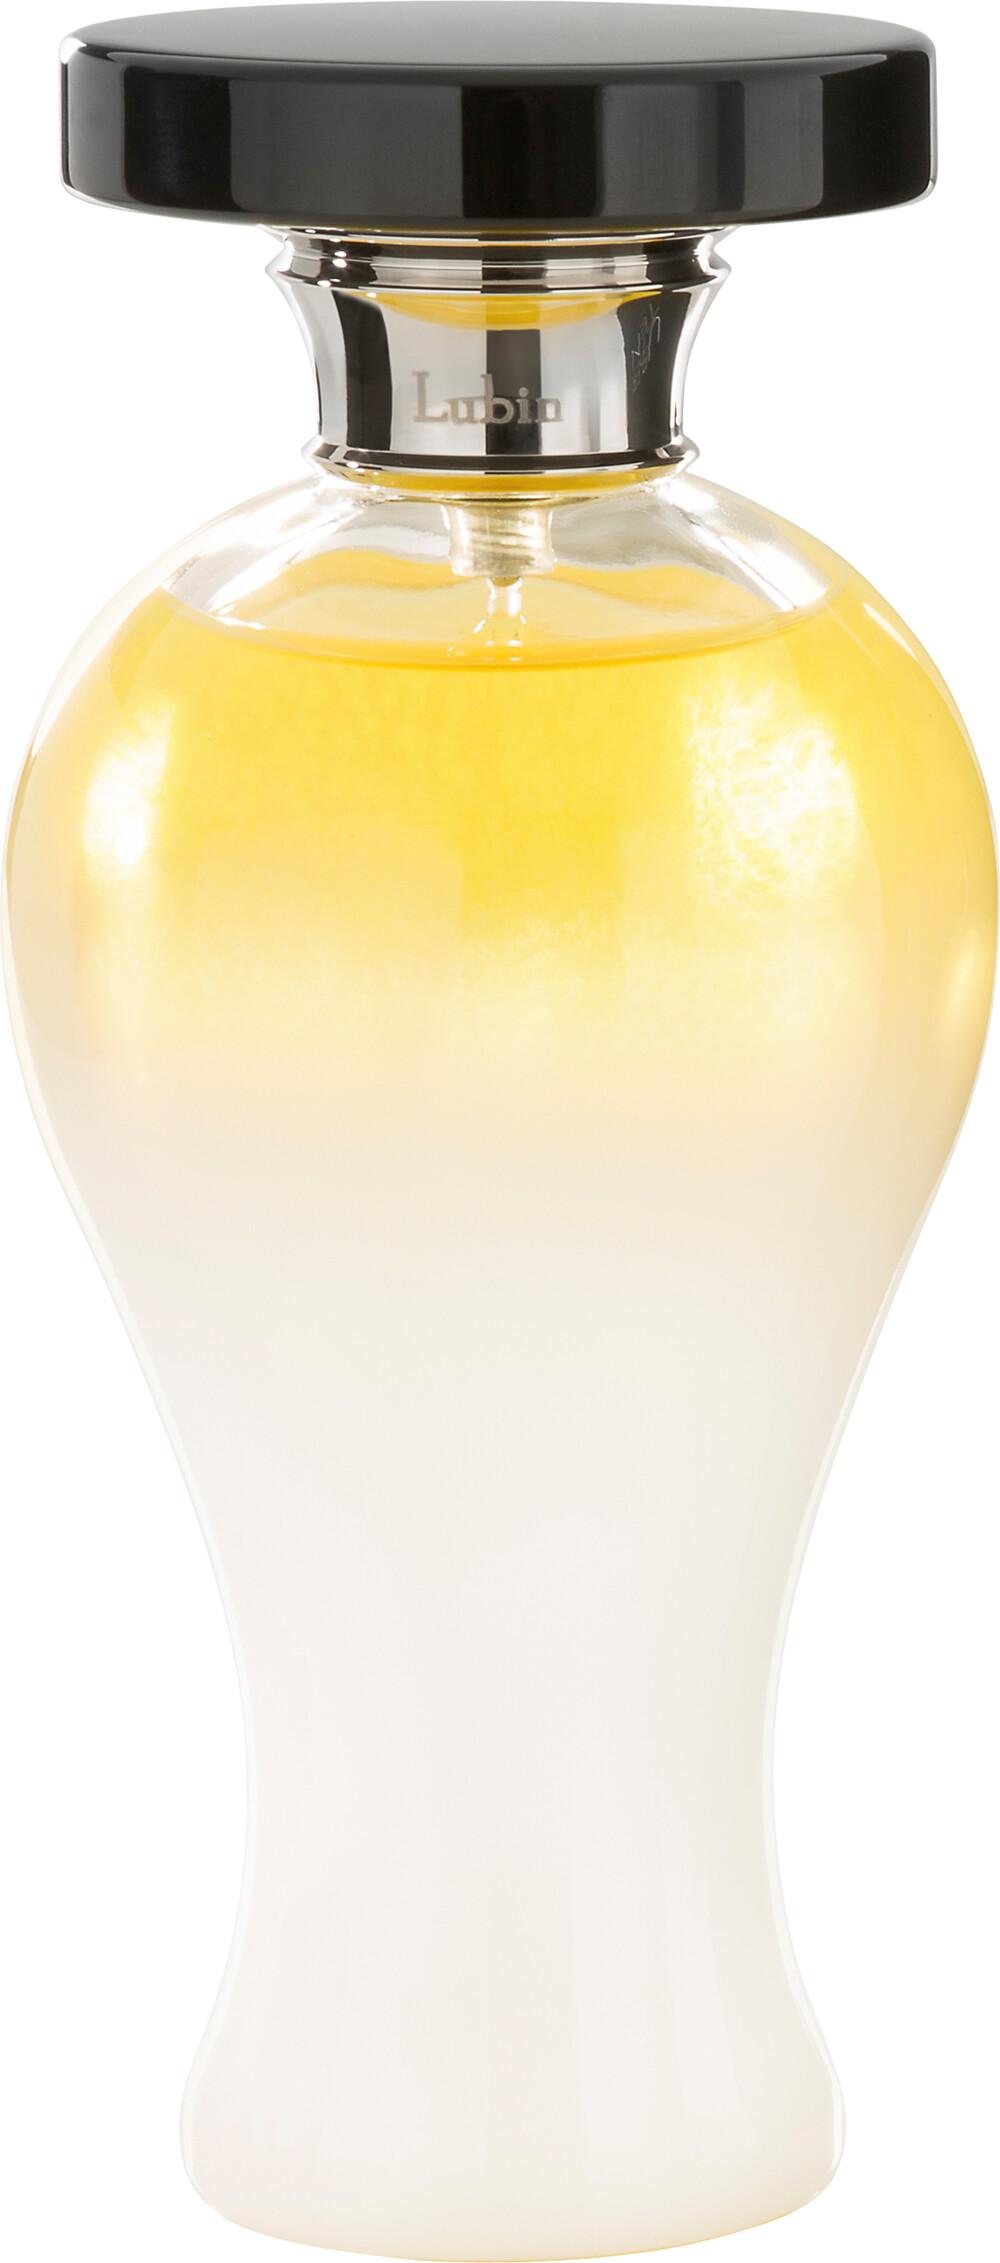 Lubin Upper Ten For Her Eau de Parfum Spray 50ml